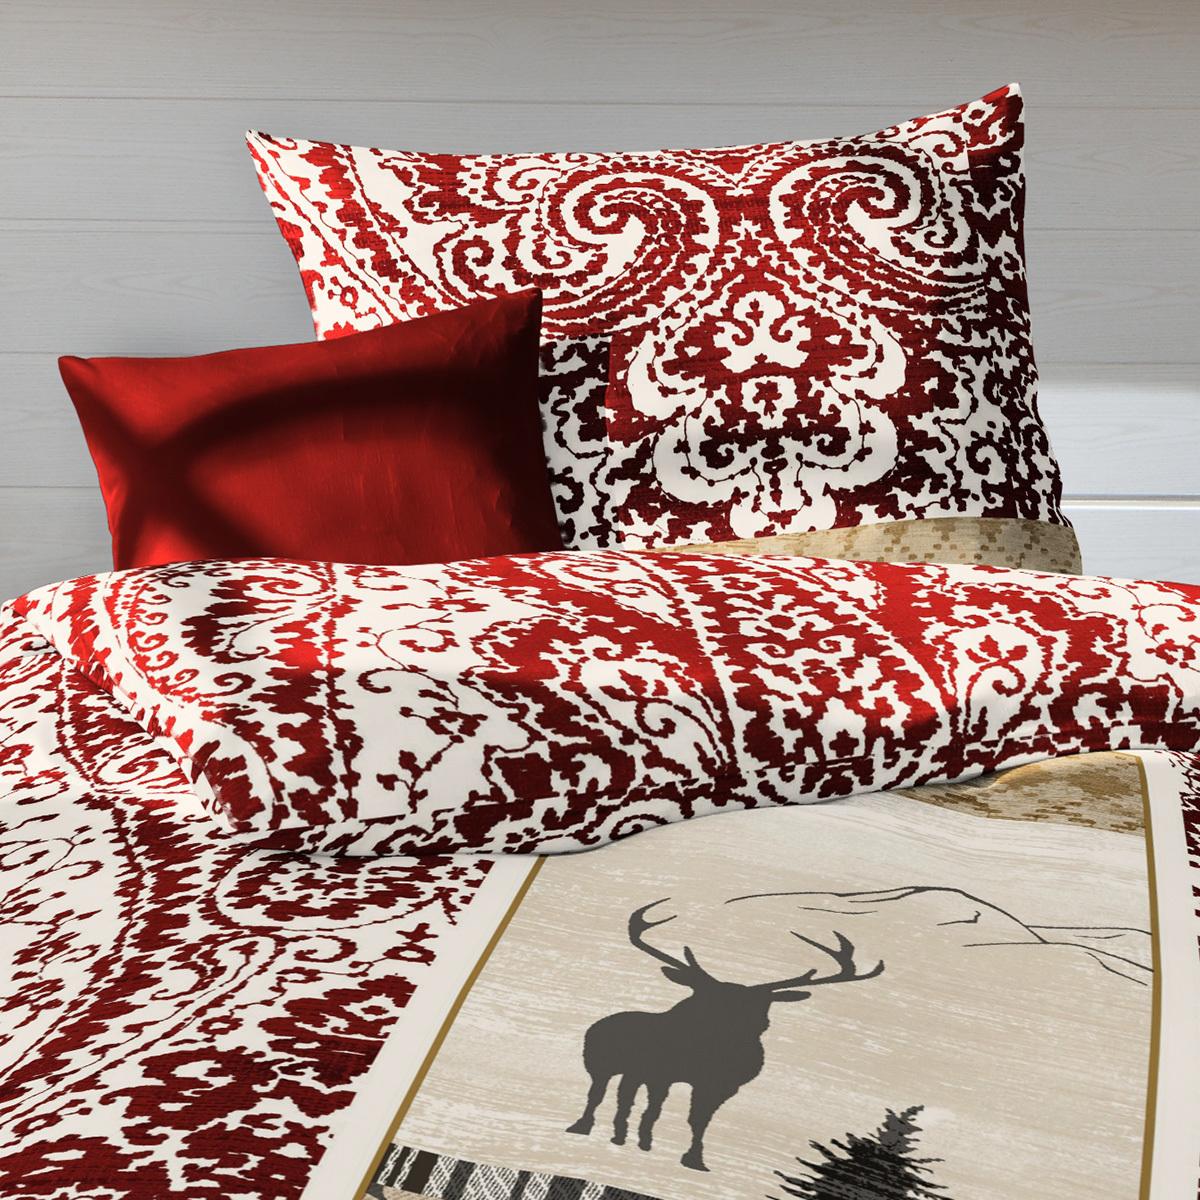 fleuresse feinbiber bettw sche hirsch rot g nstig online kaufen bei bettwaren shop. Black Bedroom Furniture Sets. Home Design Ideas